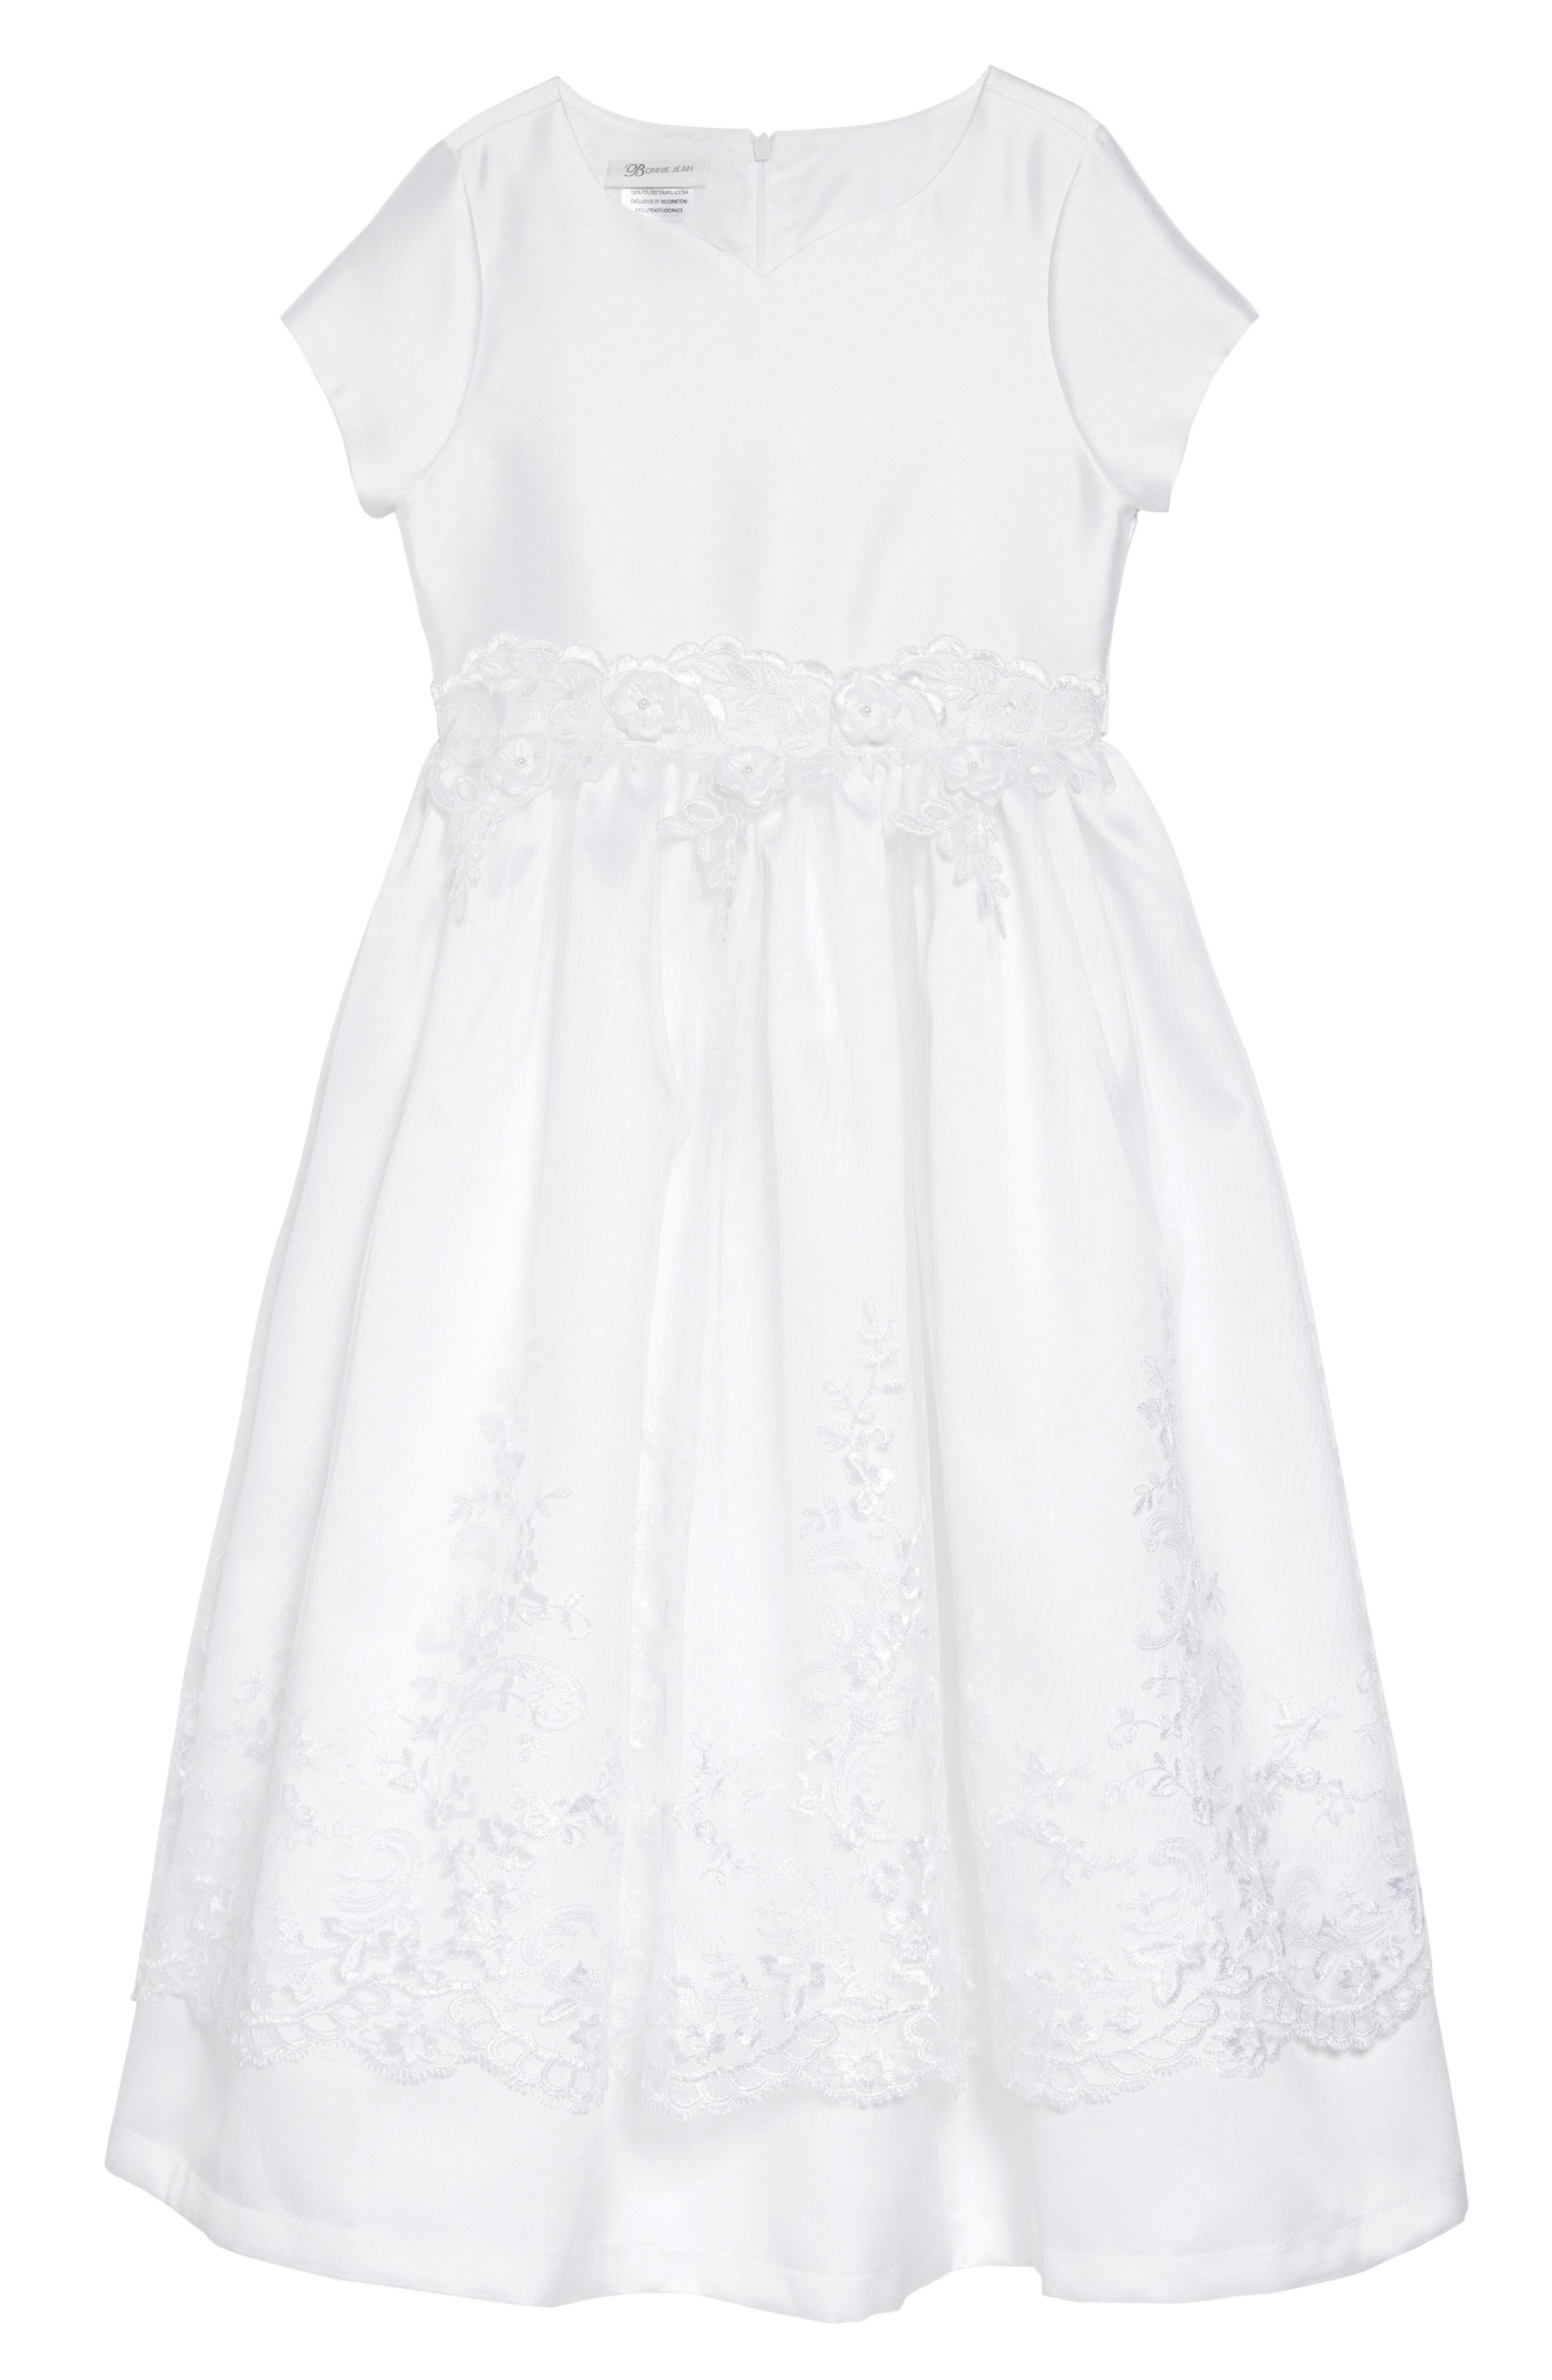 IRIS & IVY Sweetheart Mikado Dress, Main, color, WHITE